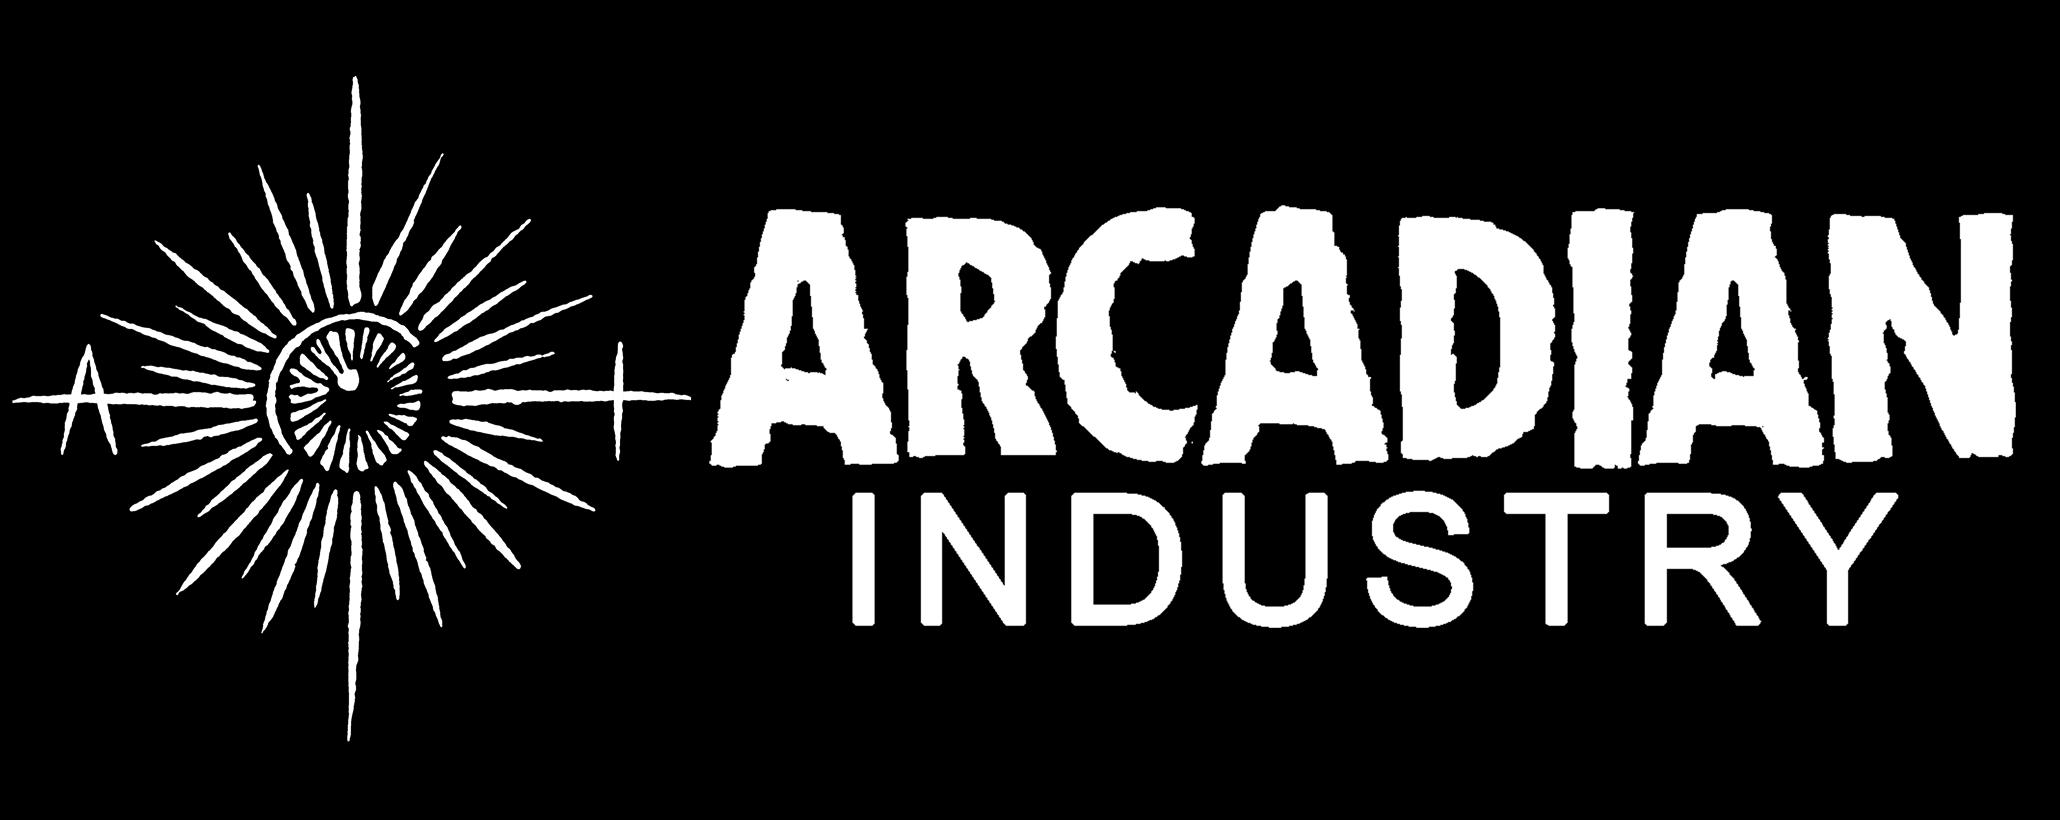 Arcadian Industry